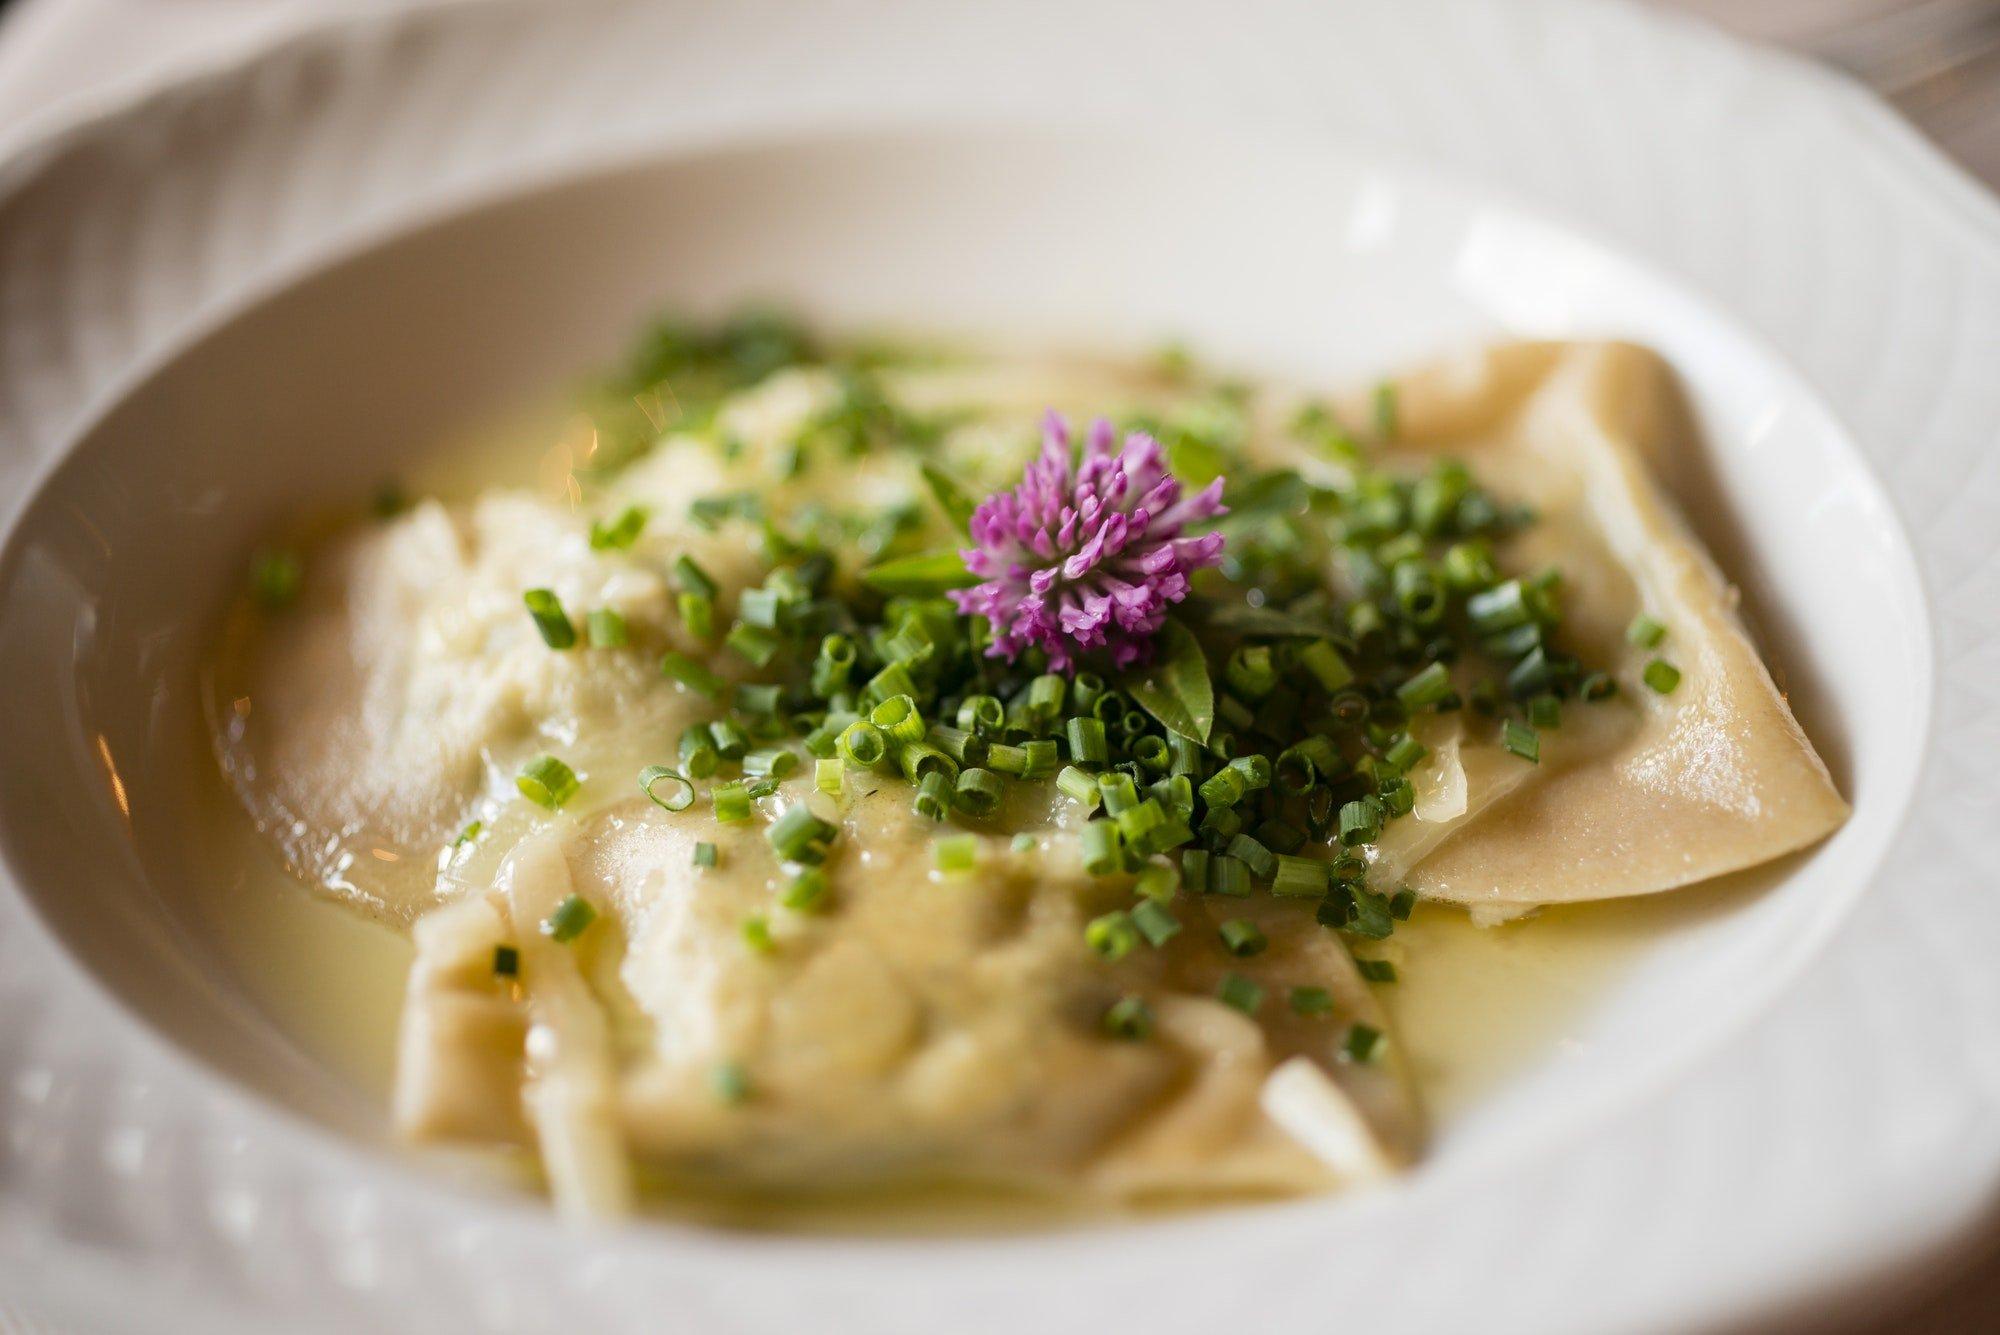 traditional Italian stuffed ortelli pasta